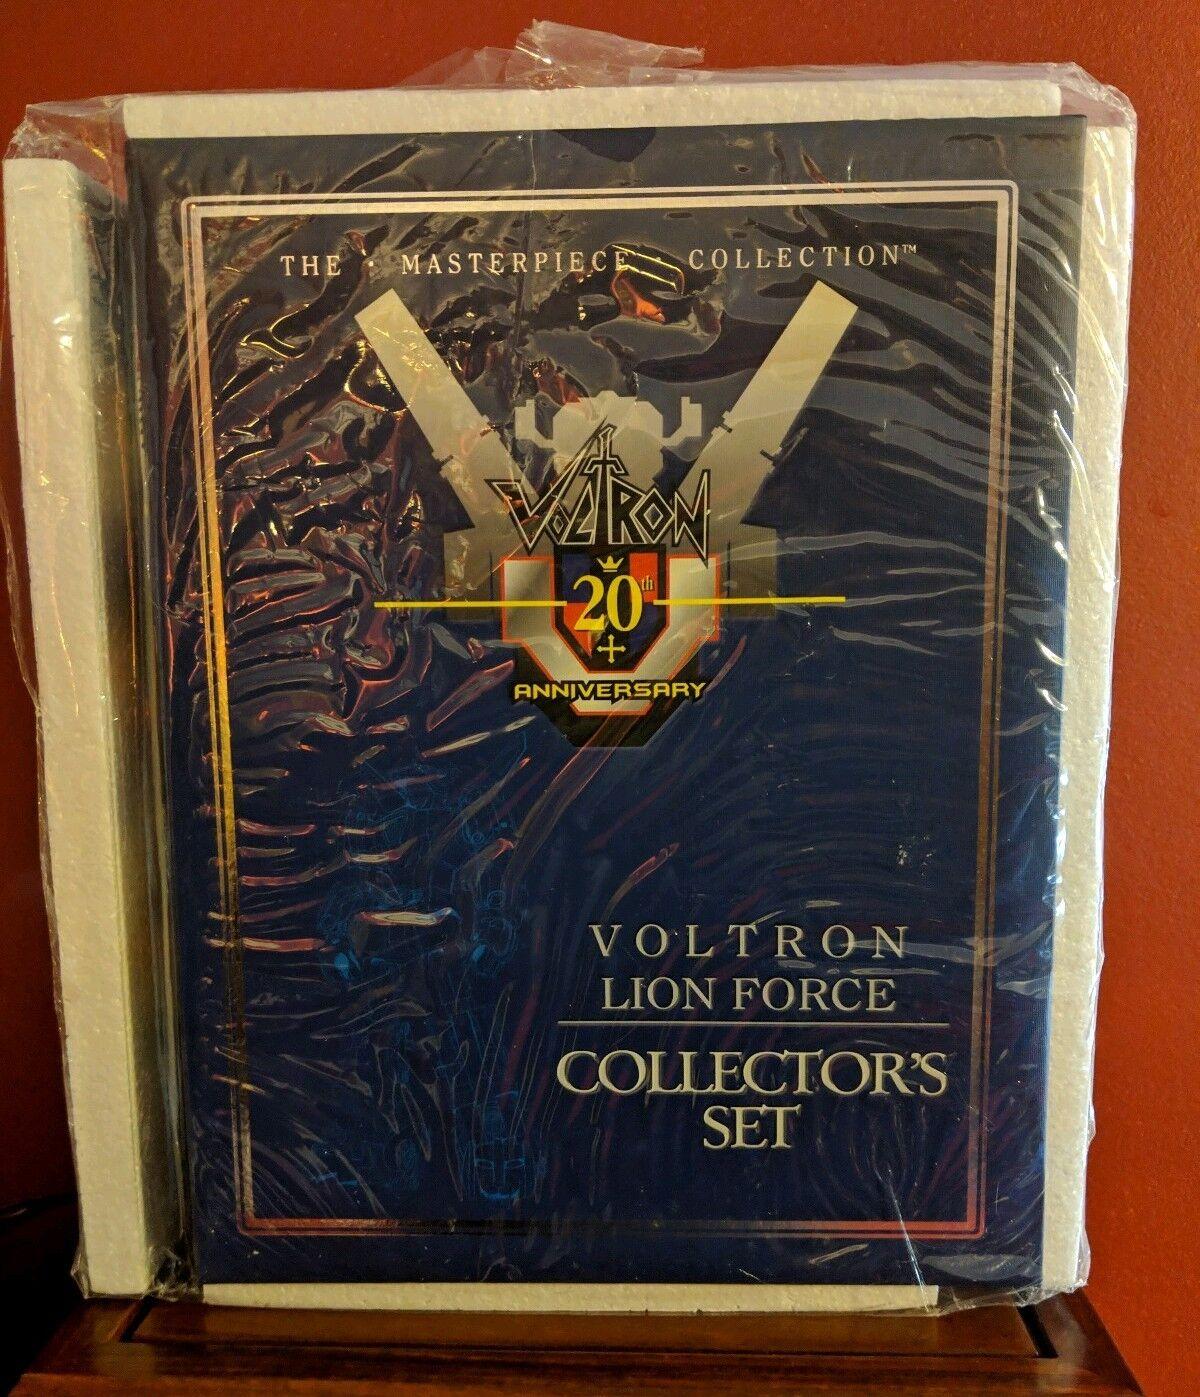 Toynami Masterpiece Voltron 20th Anniversary Lion Force Collector Set Die-Cast